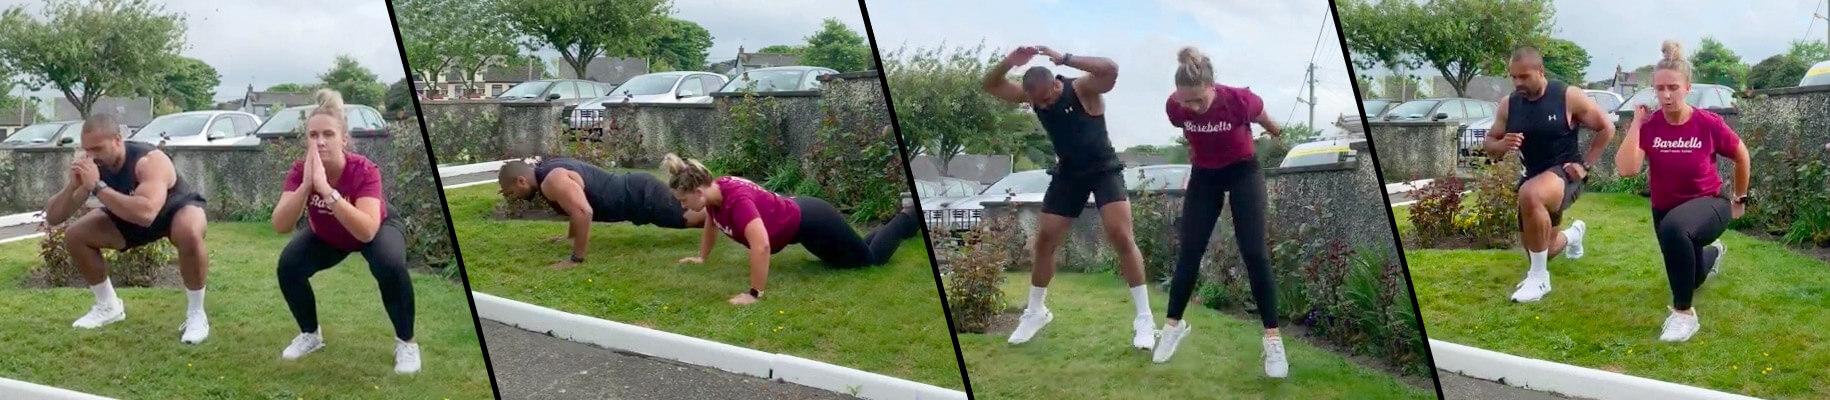 Aaron Smyth Partner Workout